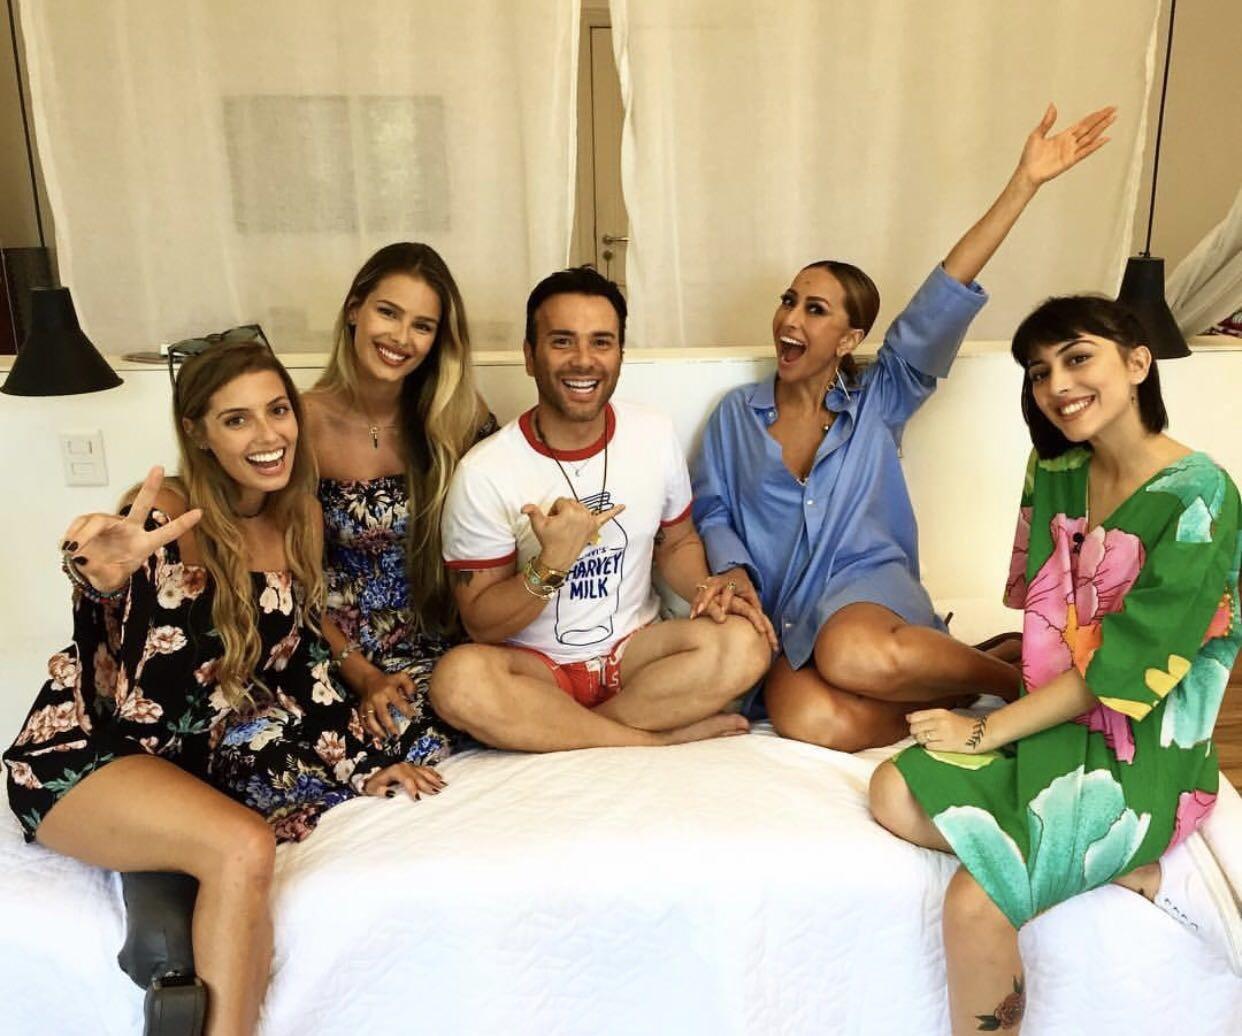 Paola Antonini, Yasmin Brunet, Mat, Sabrina e Manu Trindade (Foto: Divulgação)